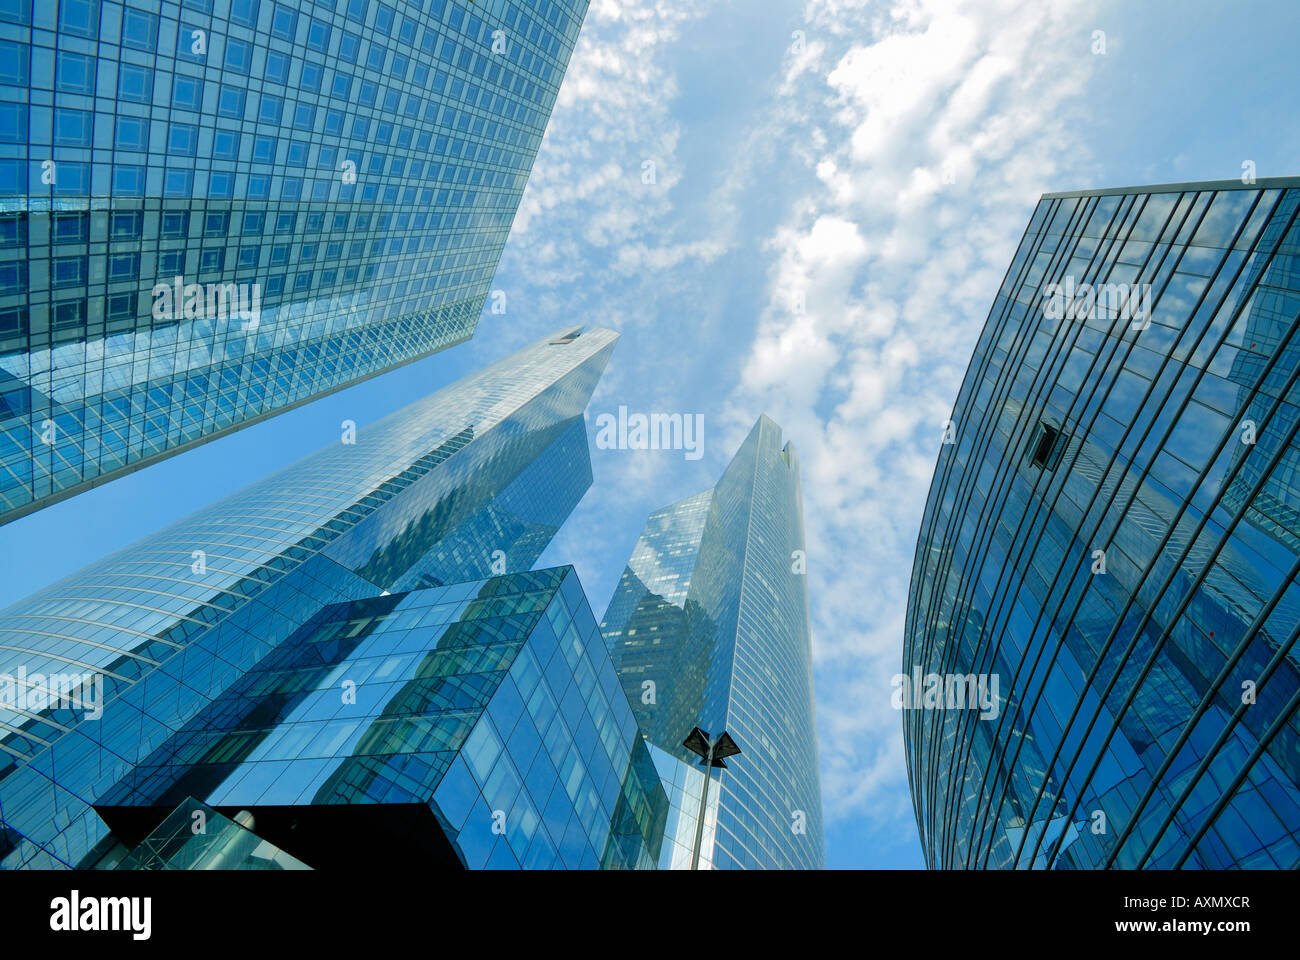 skyscrapers in financial district of La Defense Paris France - Stock Image